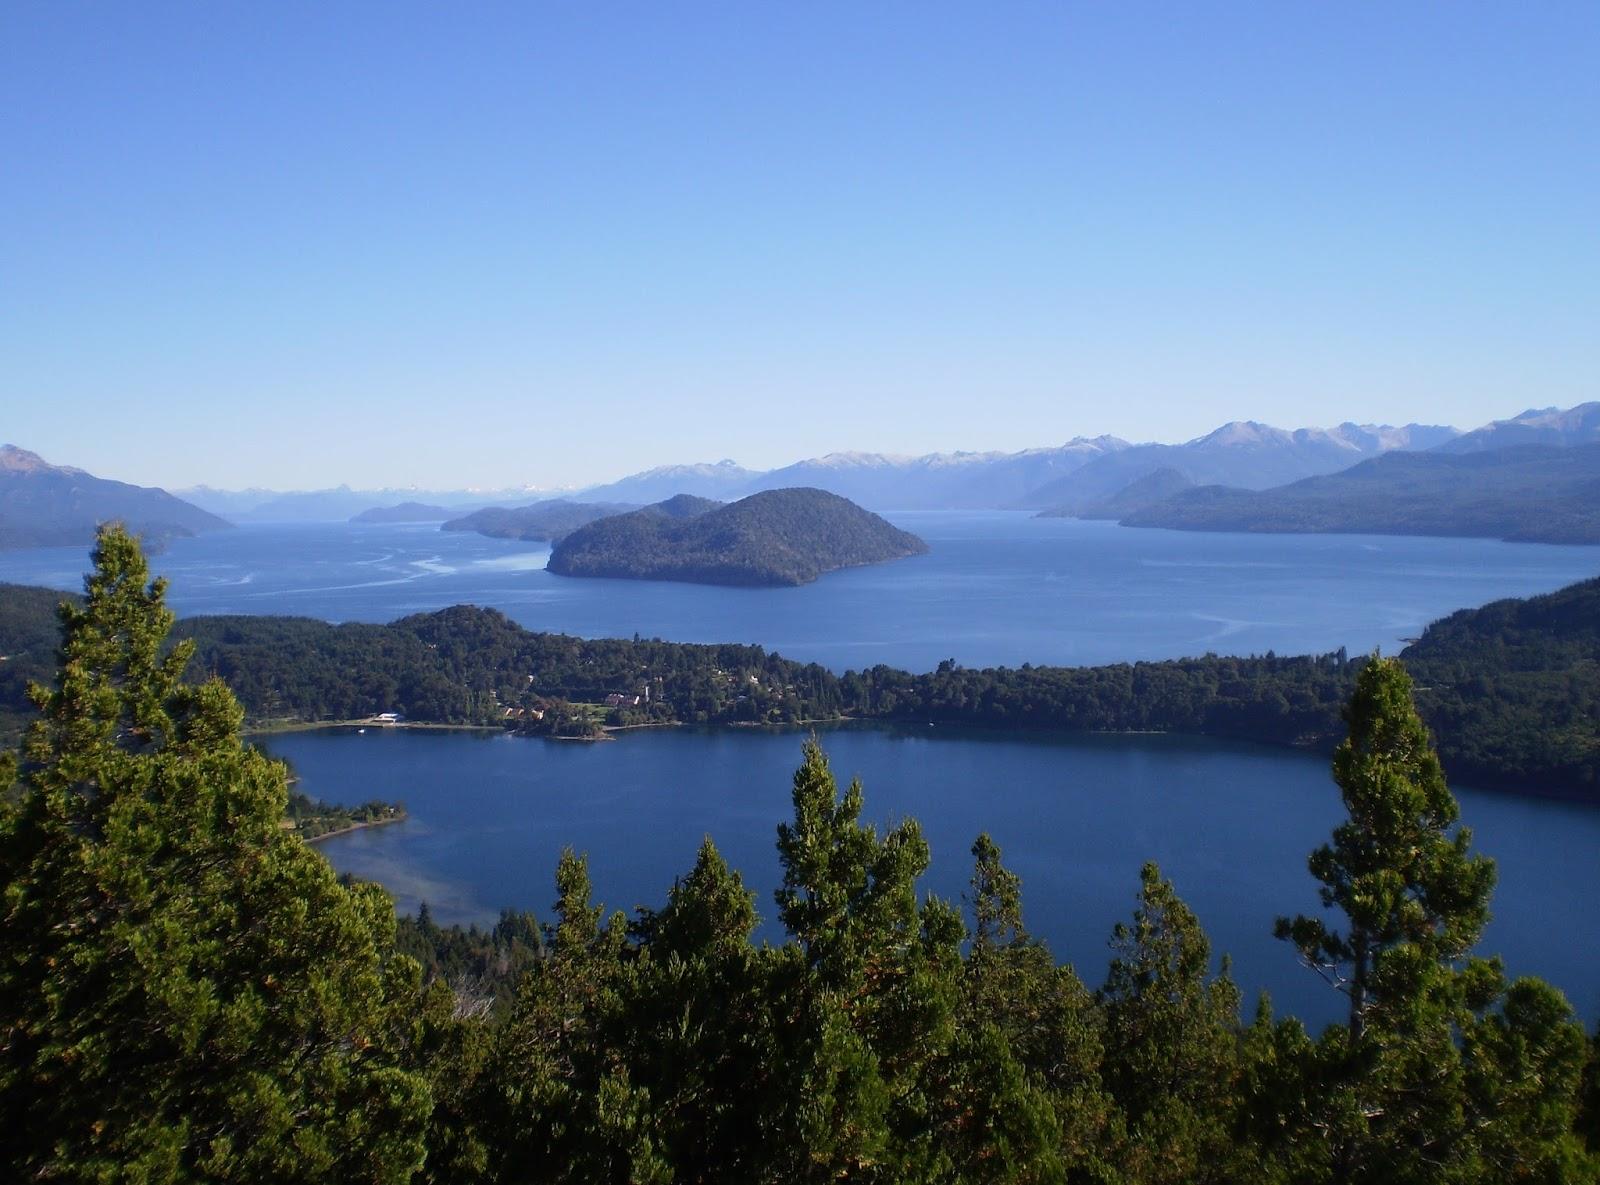 Circuito Chico : Bariloche circuito chico y cerro otto lugares especiales